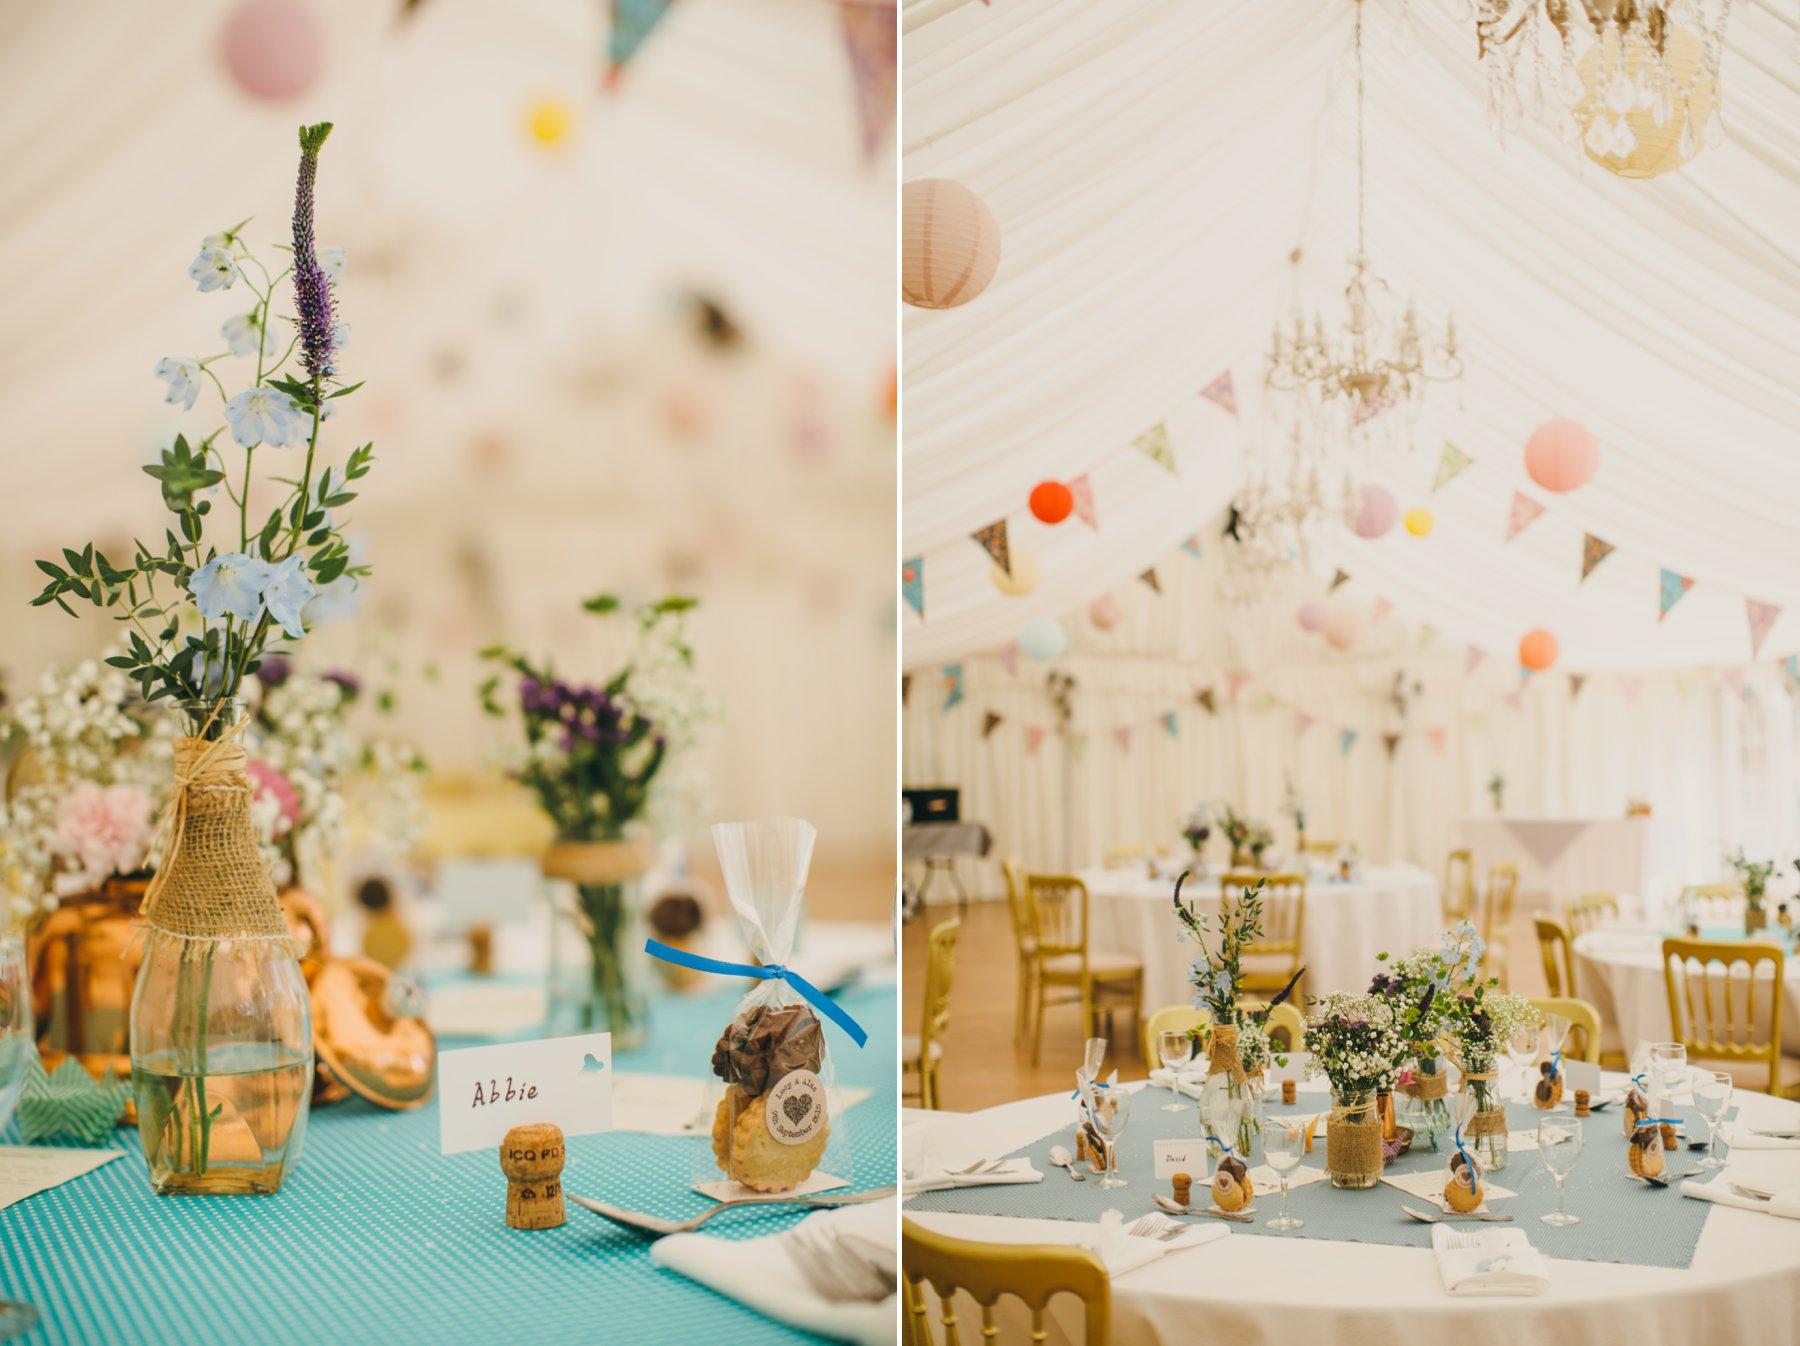 petitmoulin_france_bordeaux_weddings_0097